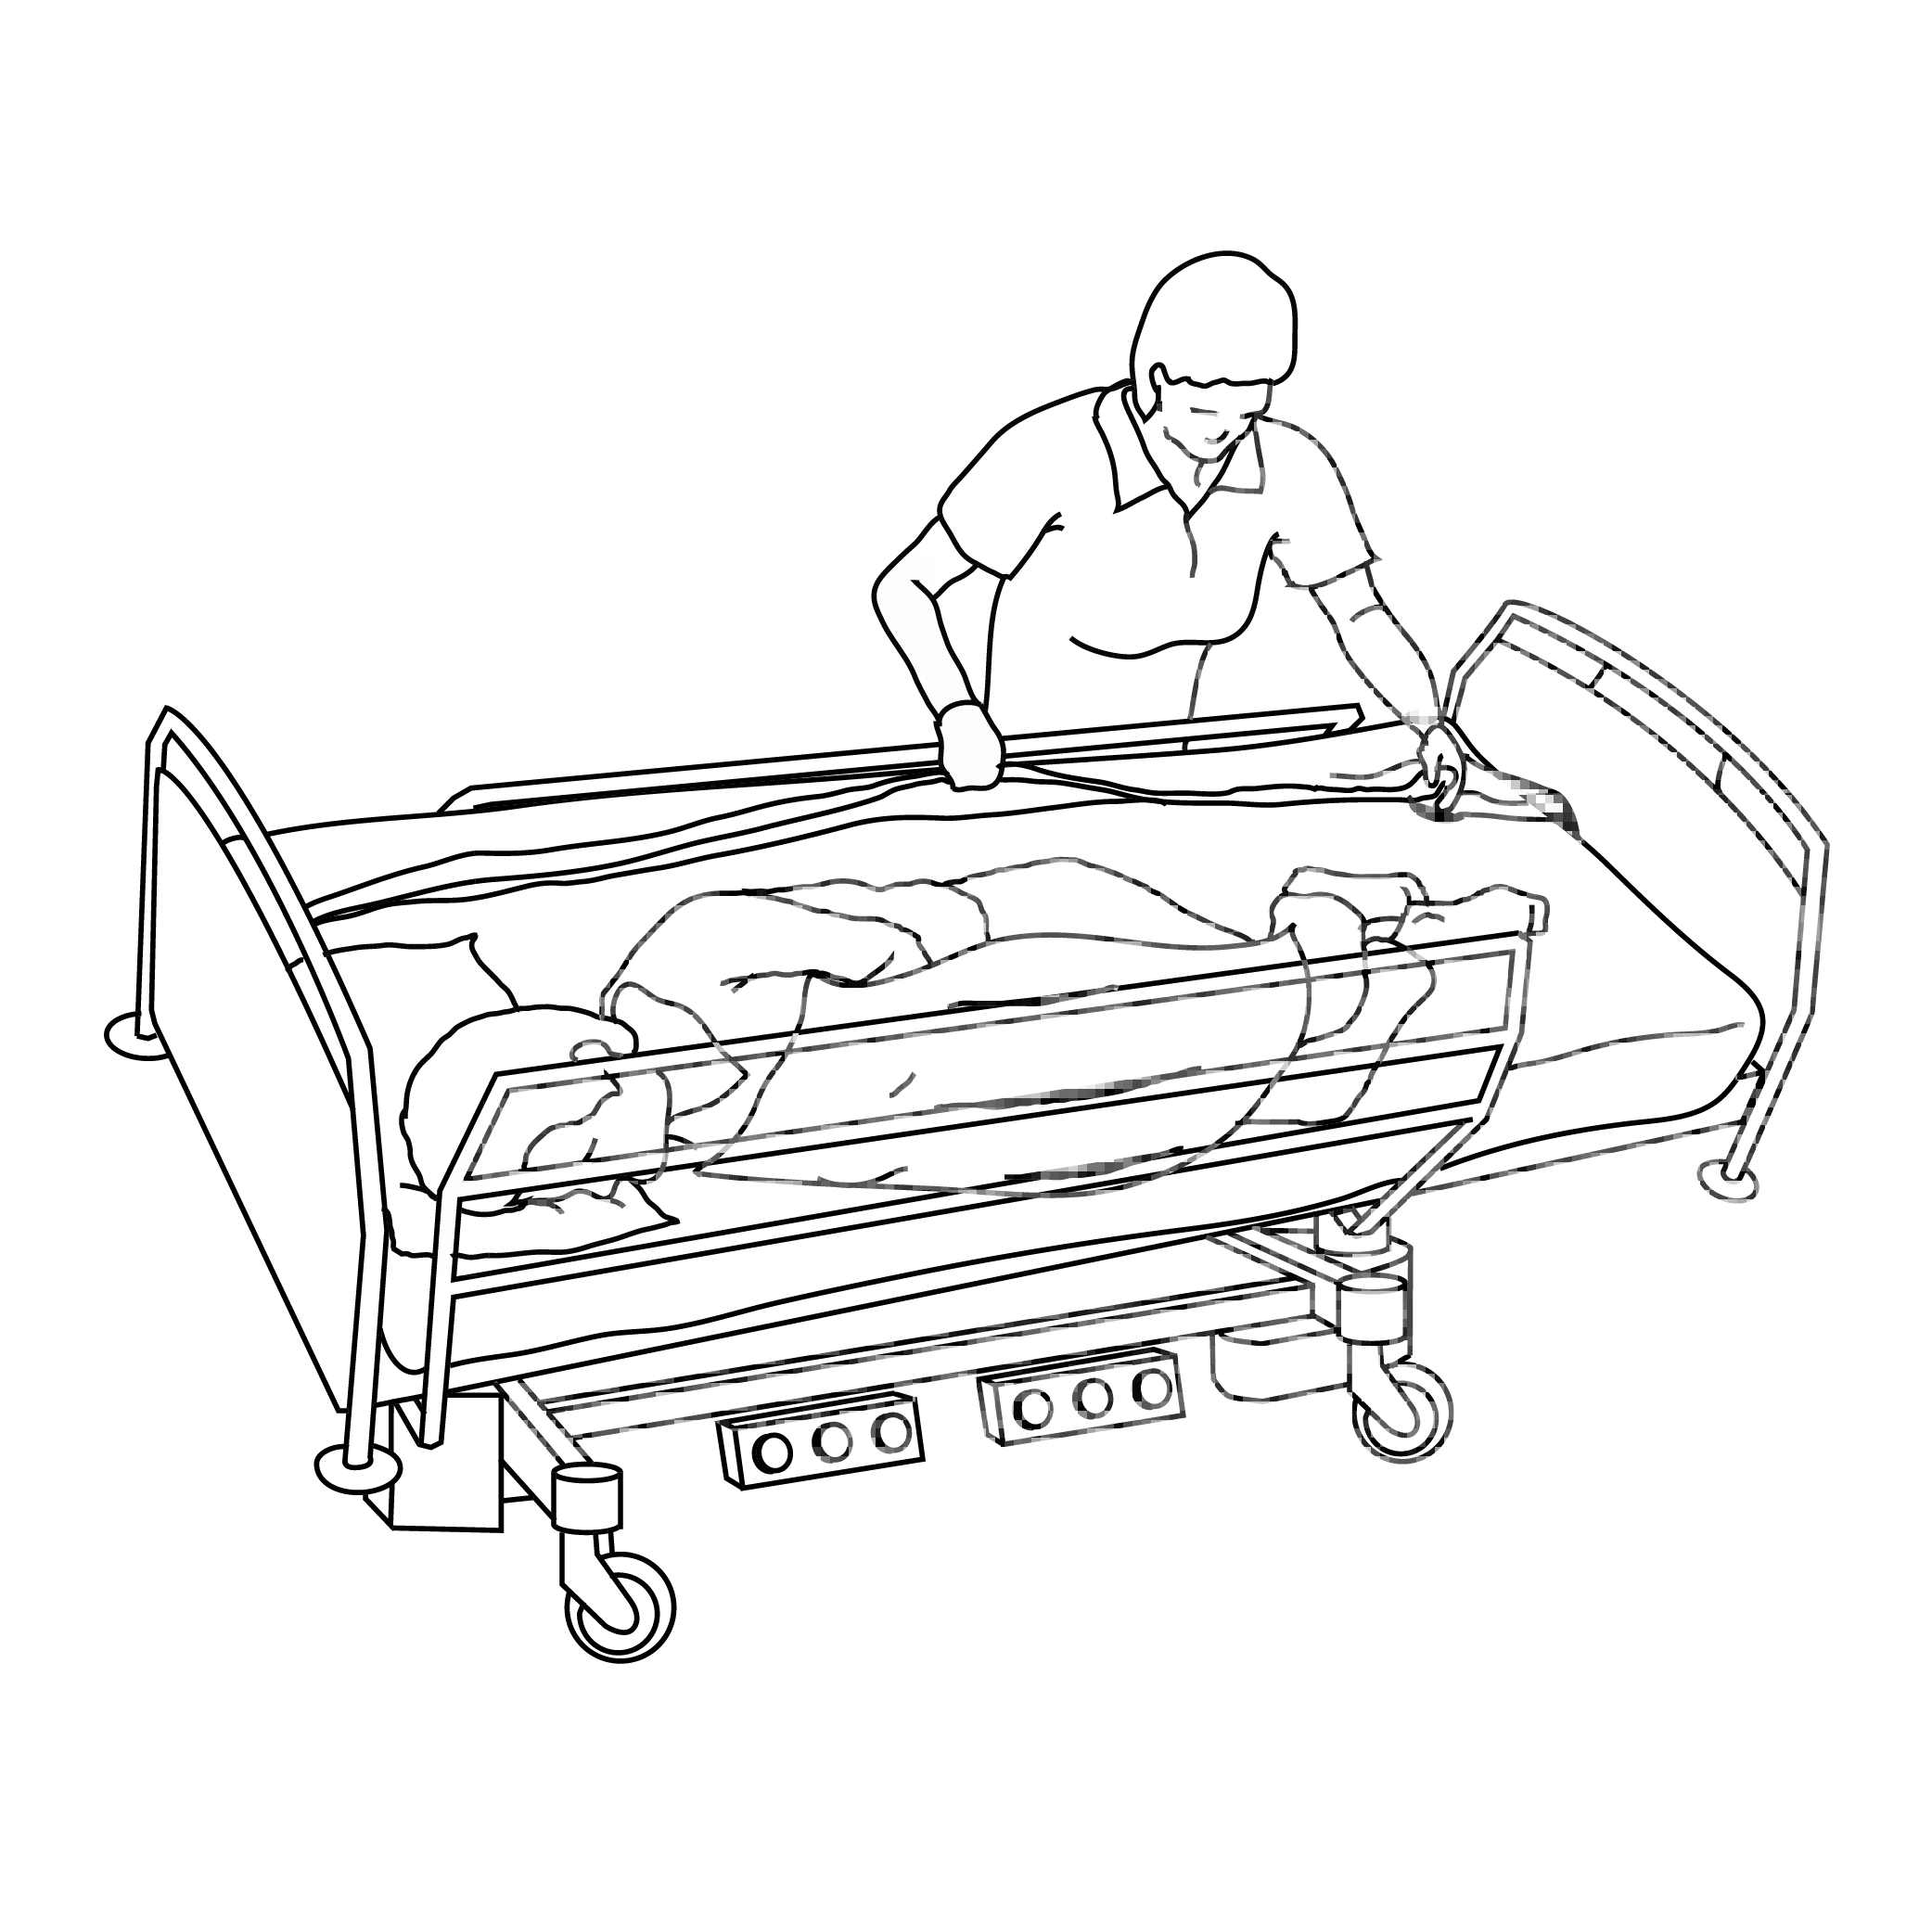 2083x2083 Latera Acute Hospital Bed